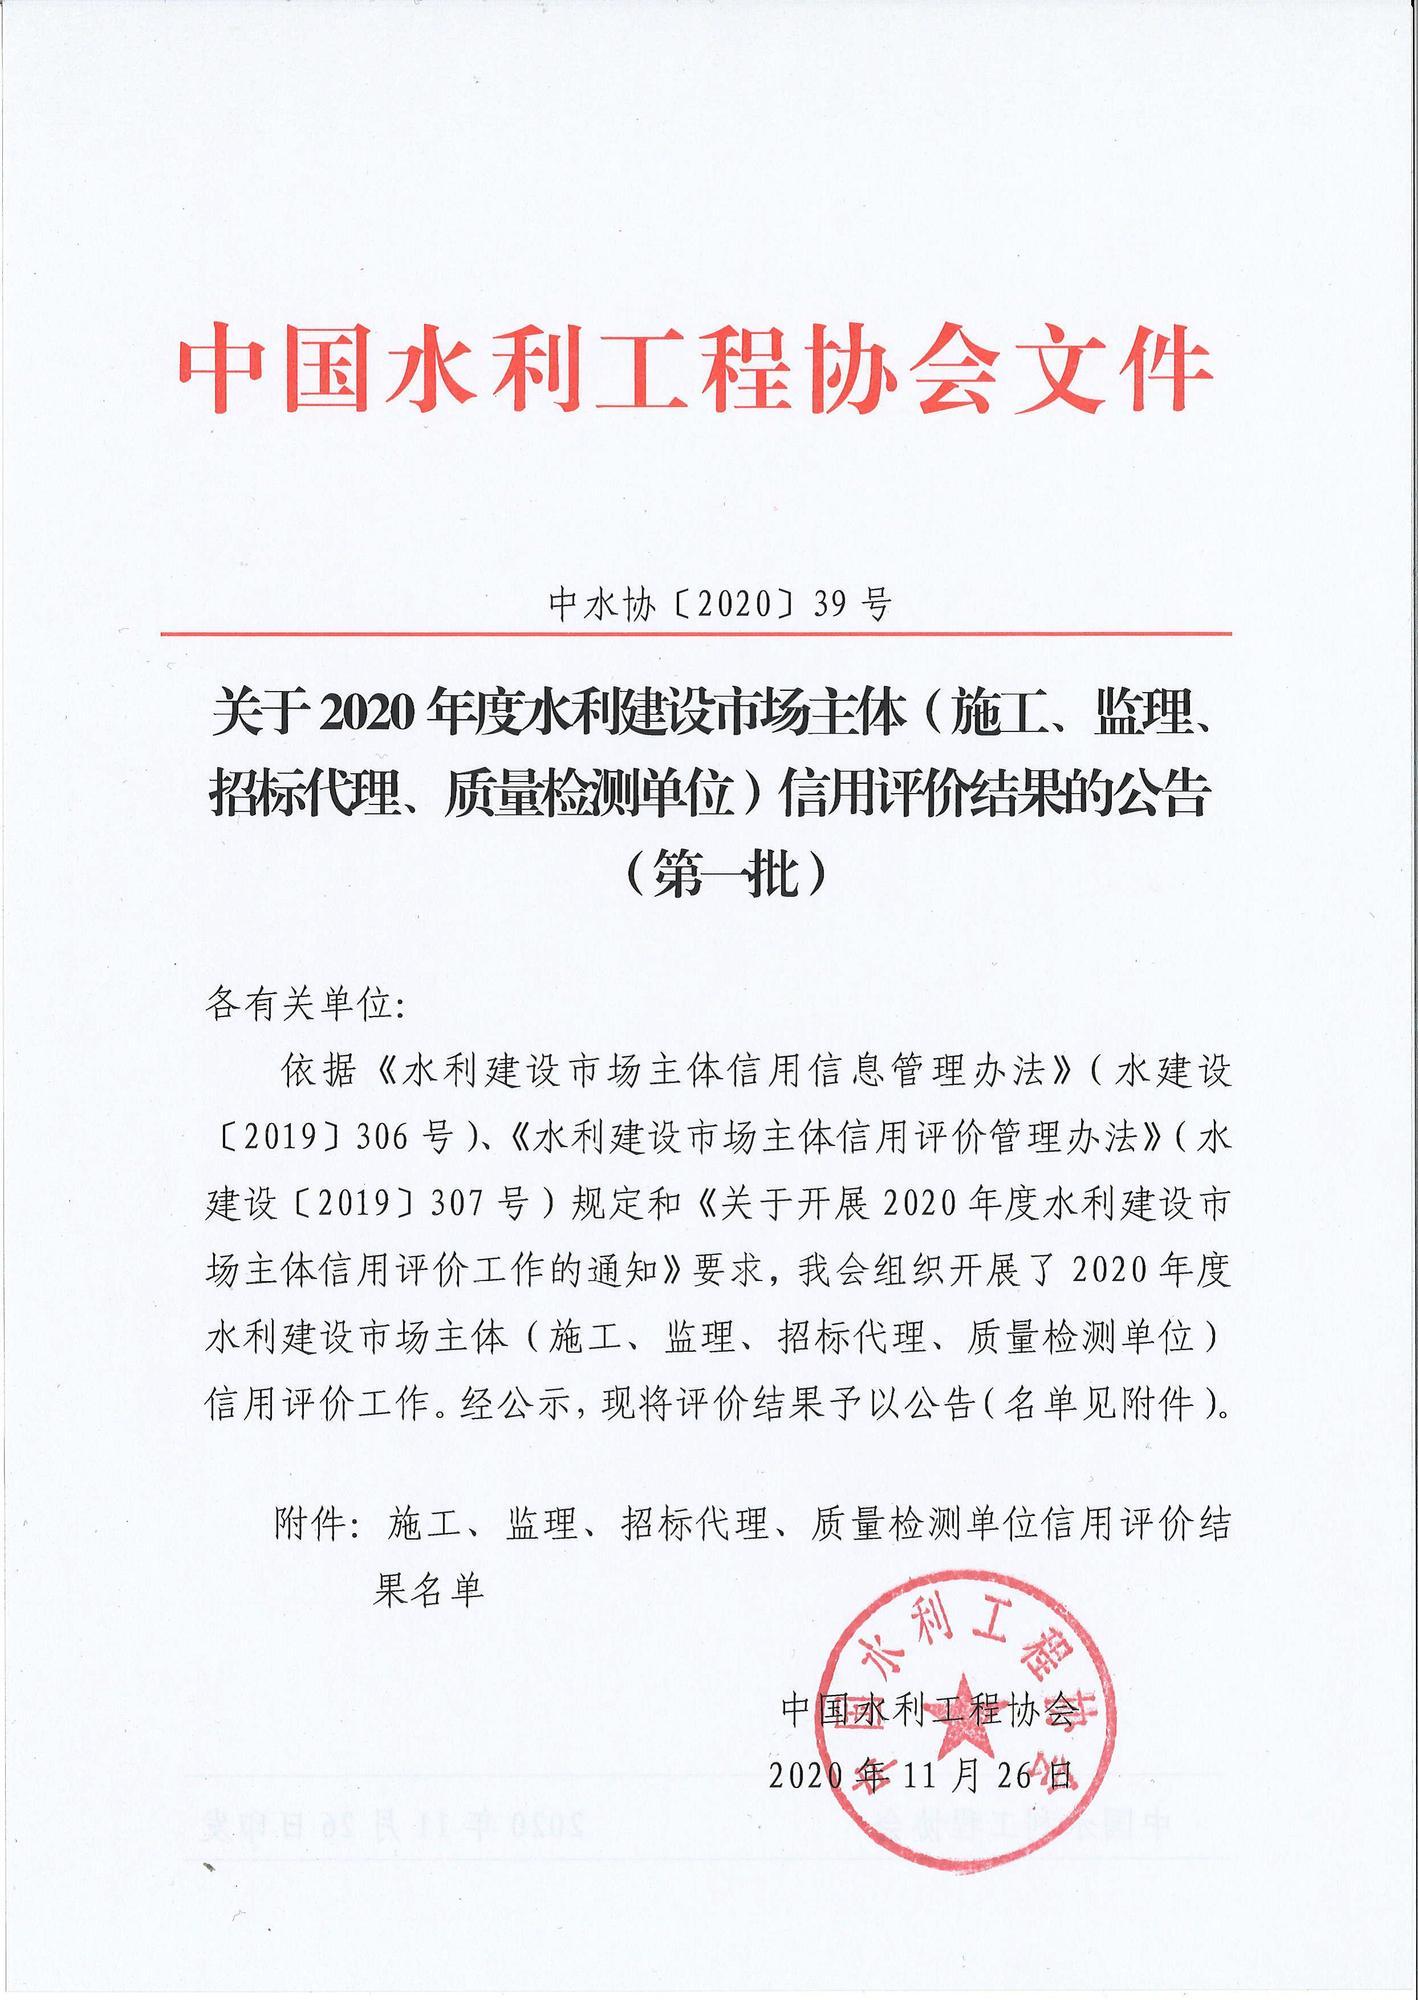 AA信用评价结果文件20201201.jpg